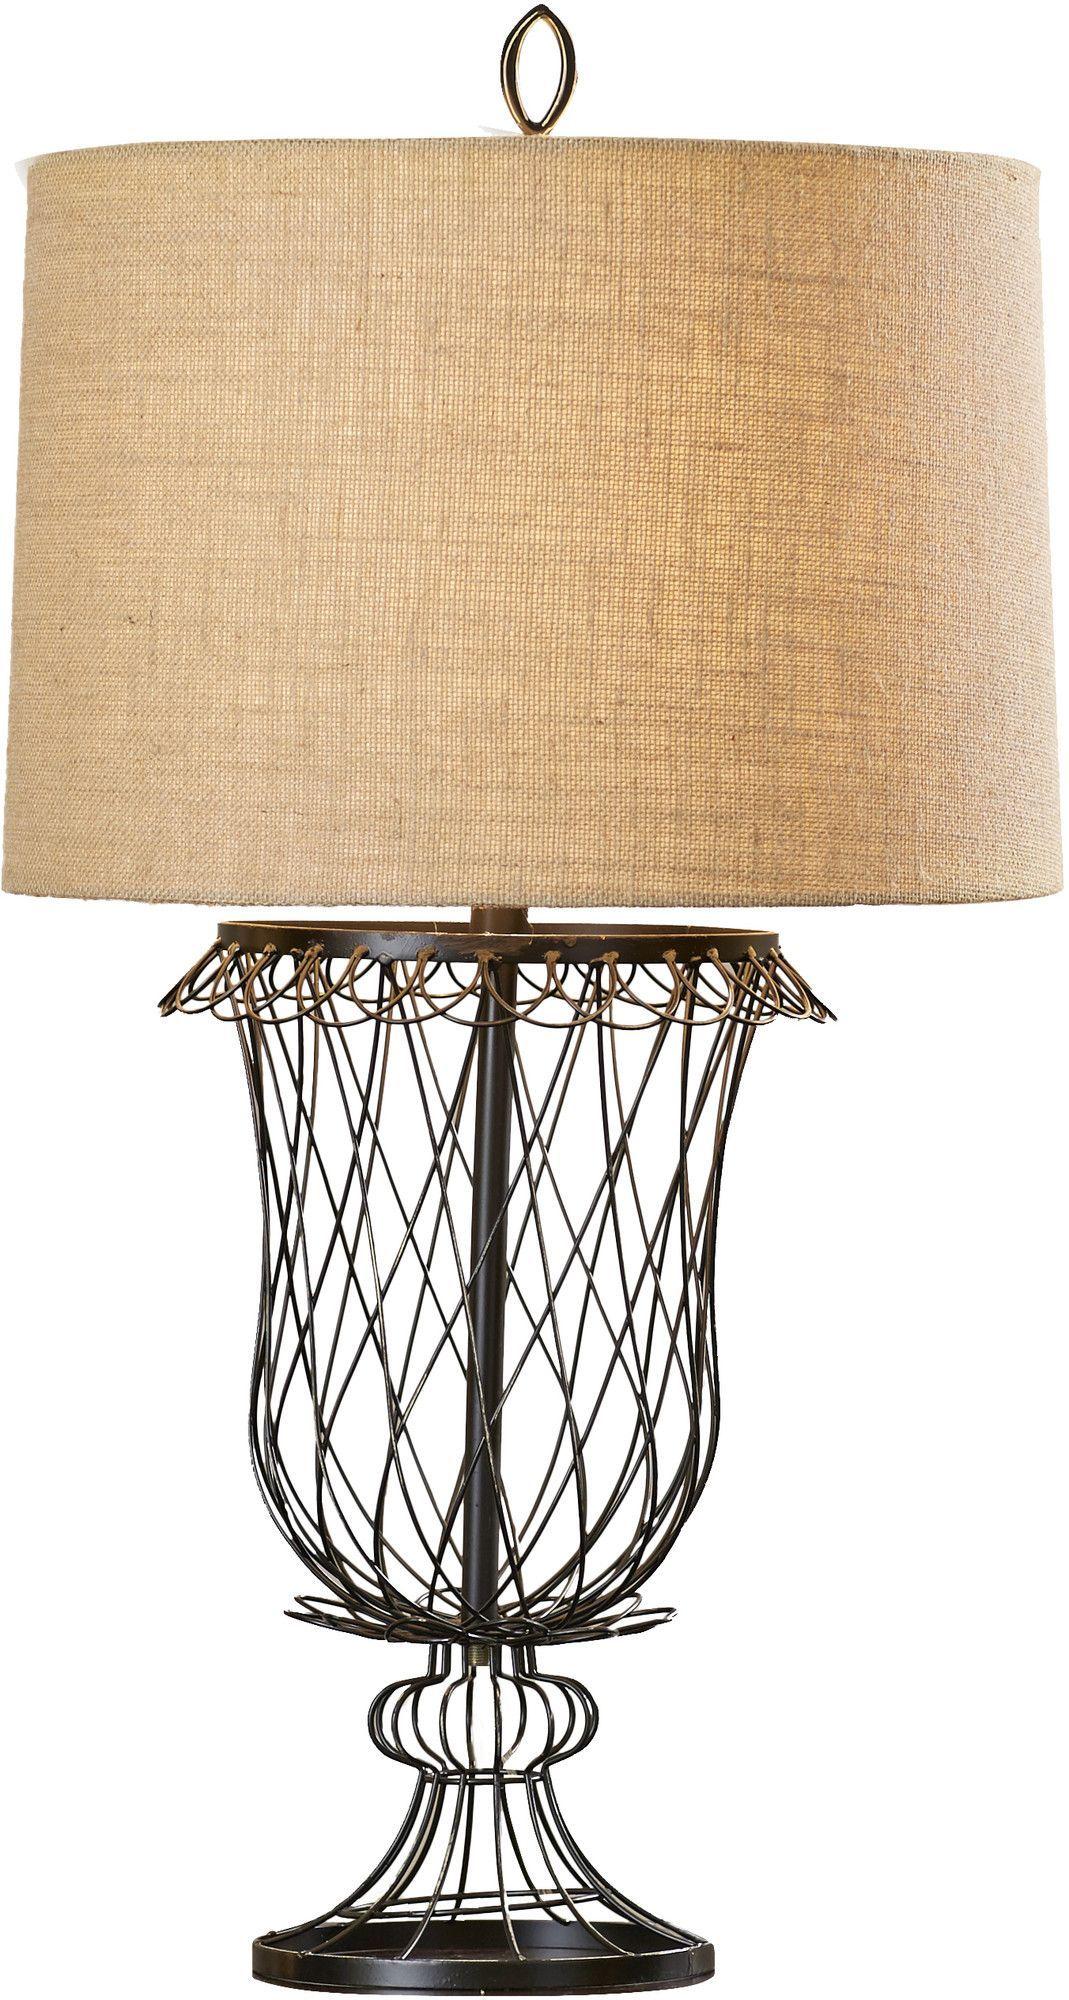 "Centerville 34"" H Table Lamp"